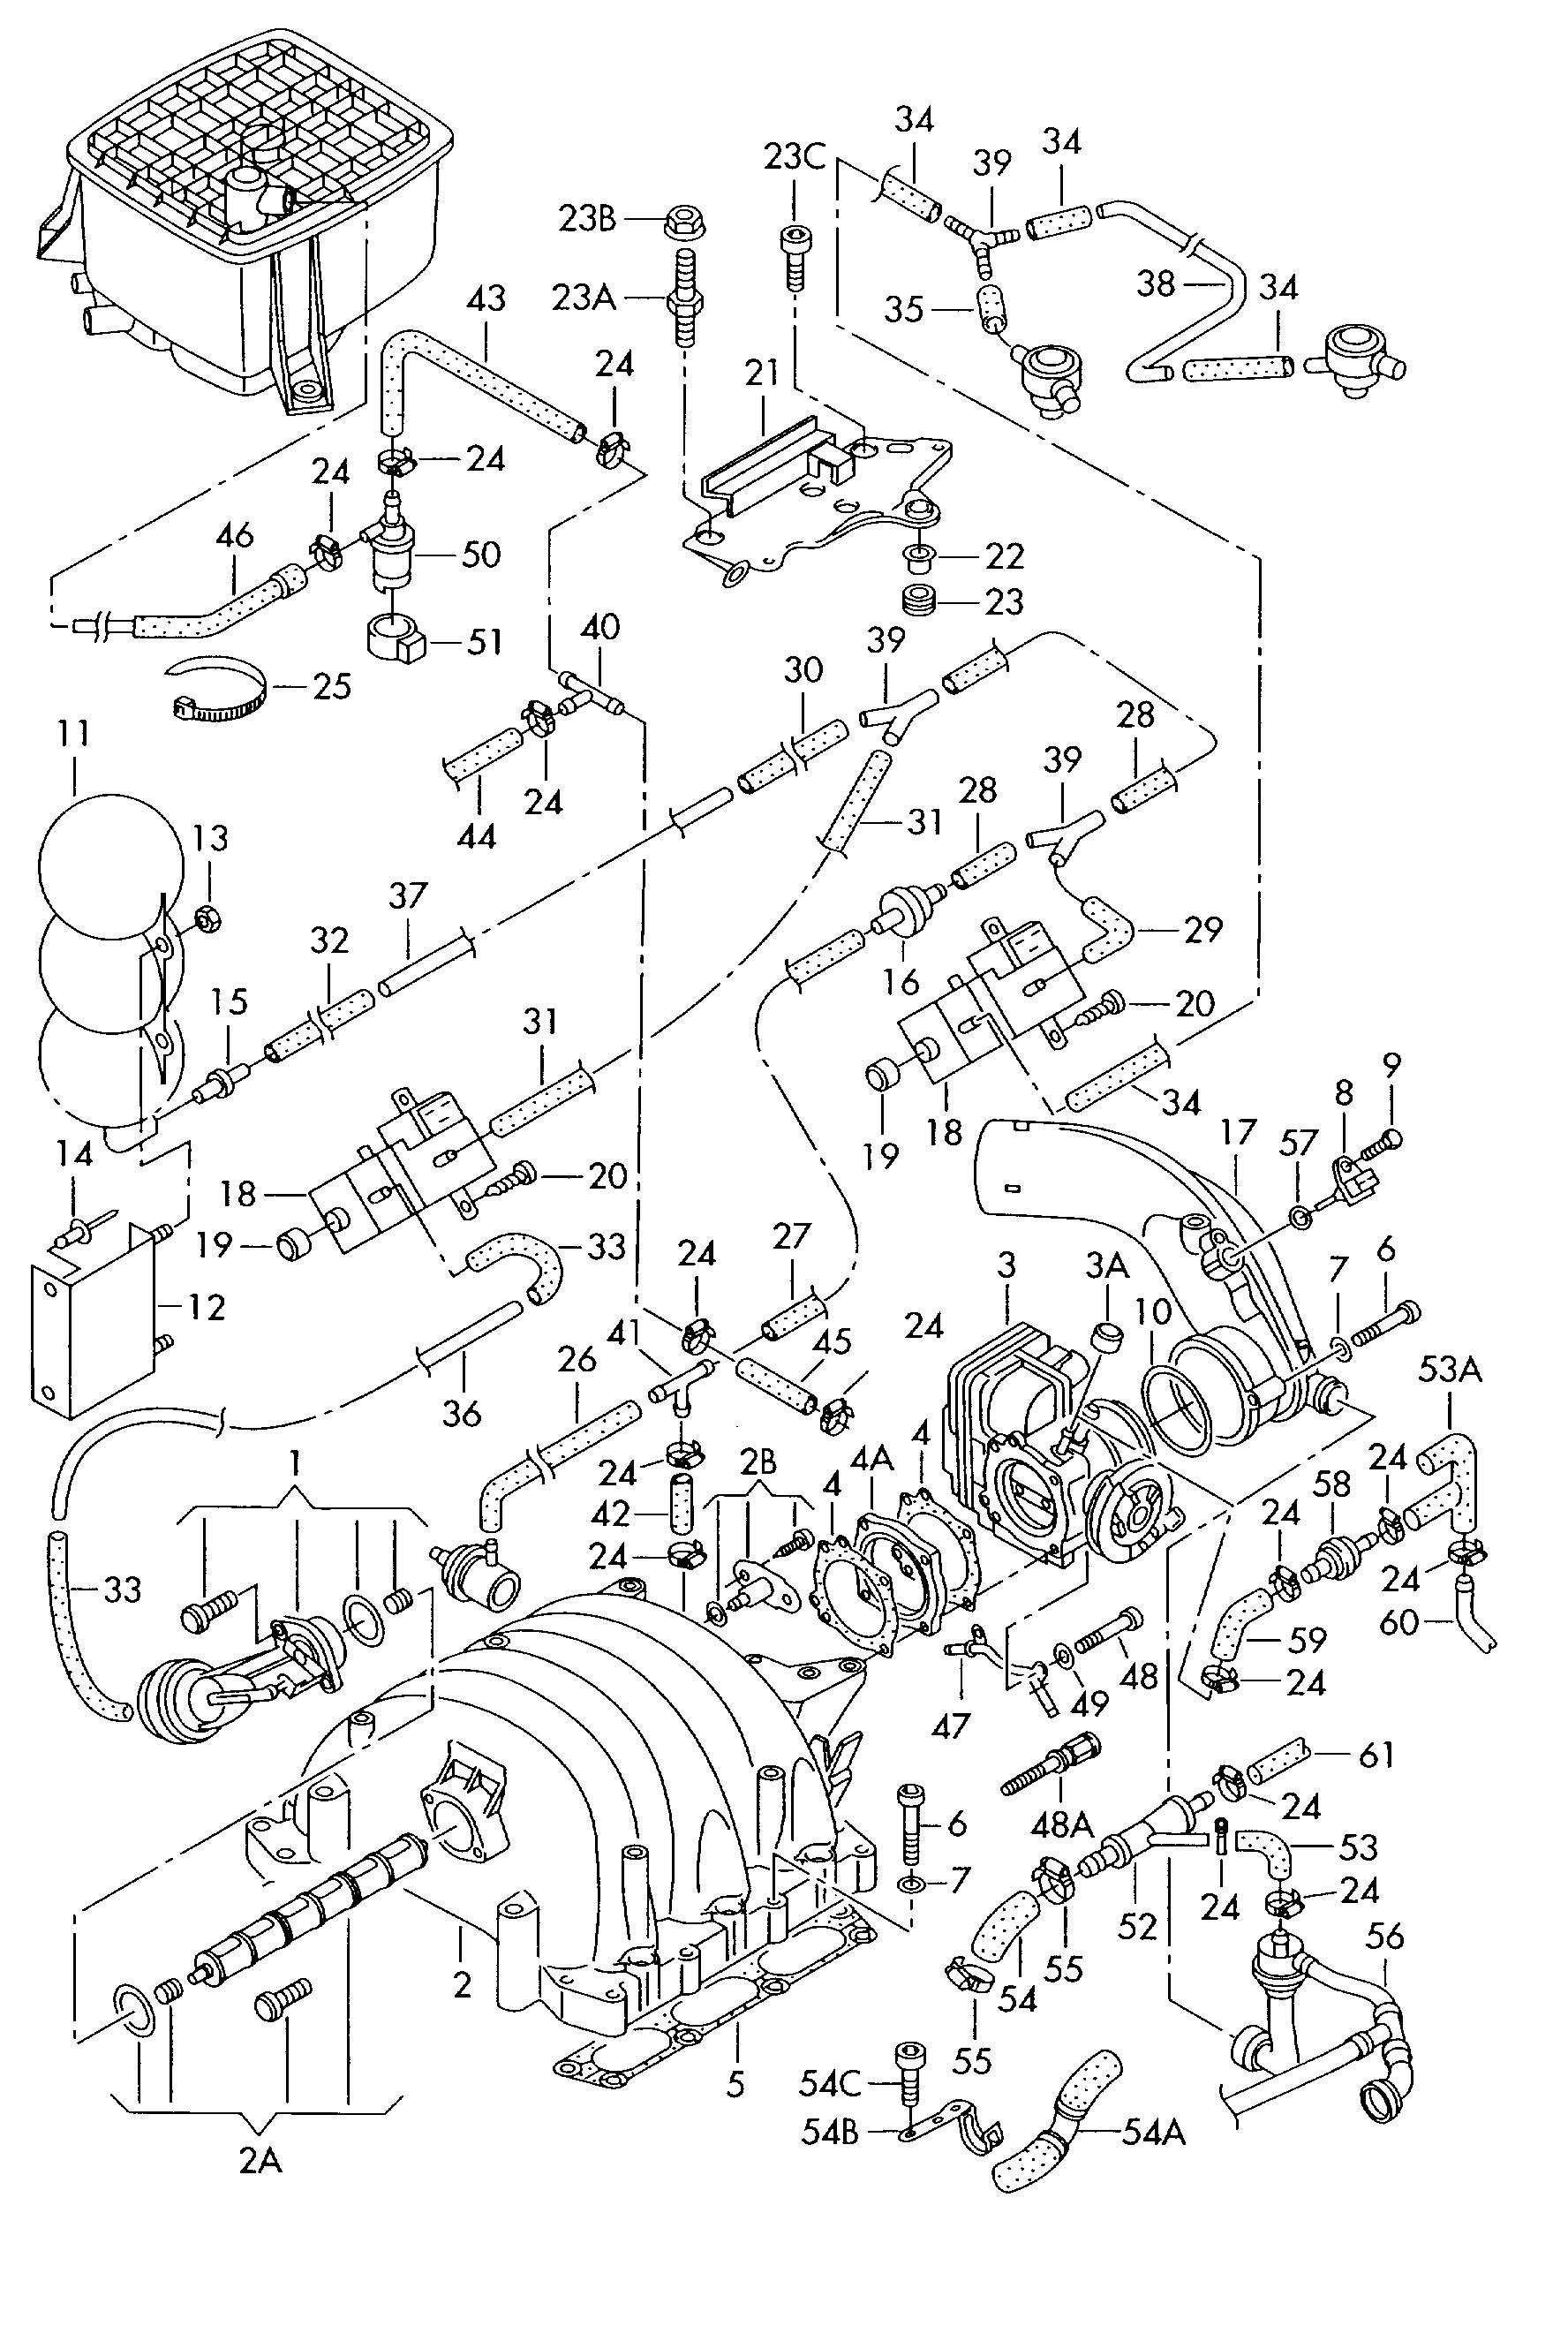 Suction Pump On 2004 Passat V6